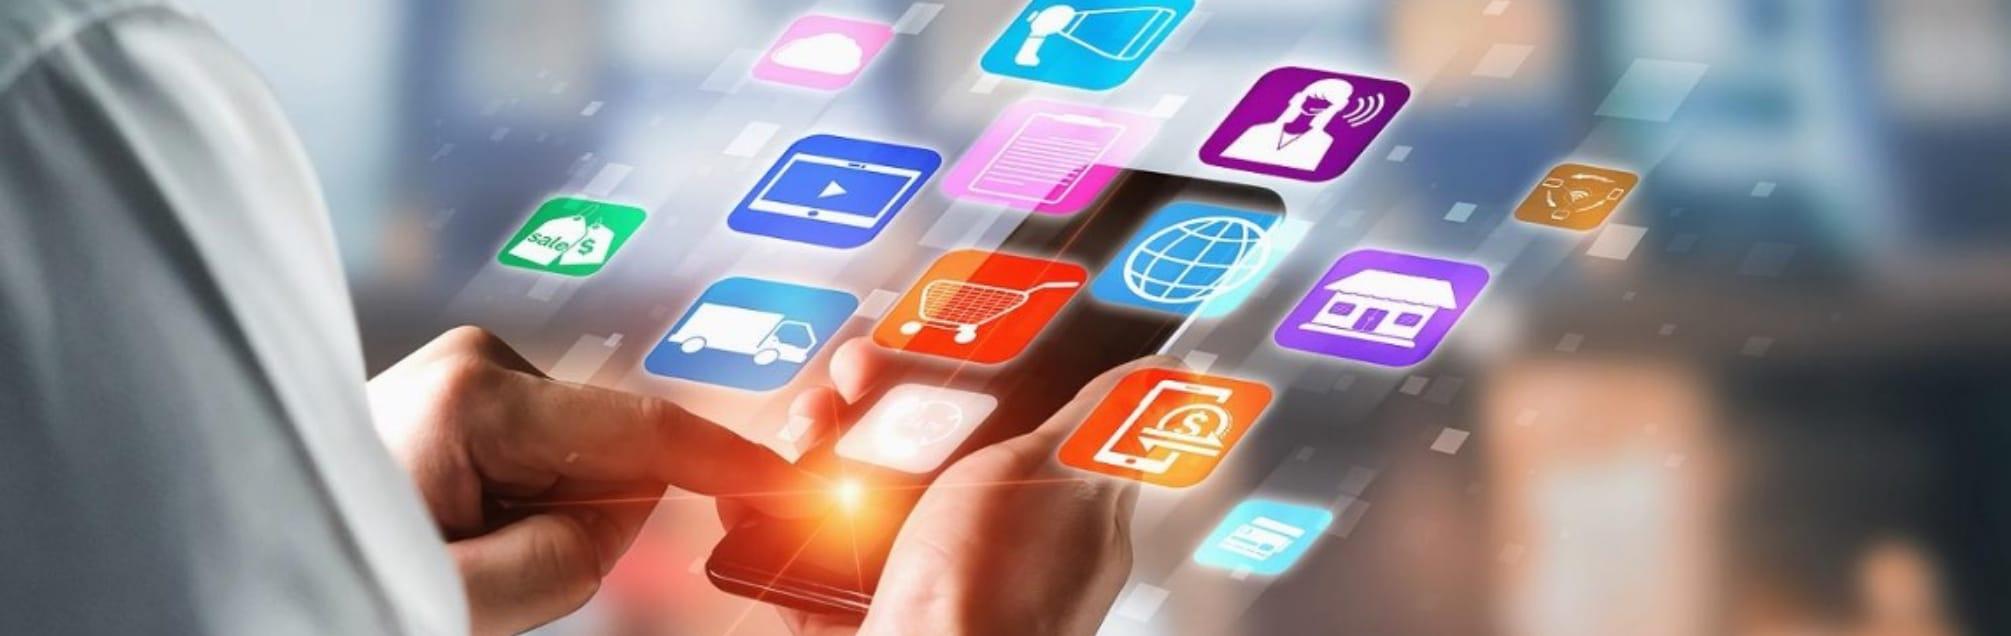 Digital vs traditional marketing 1